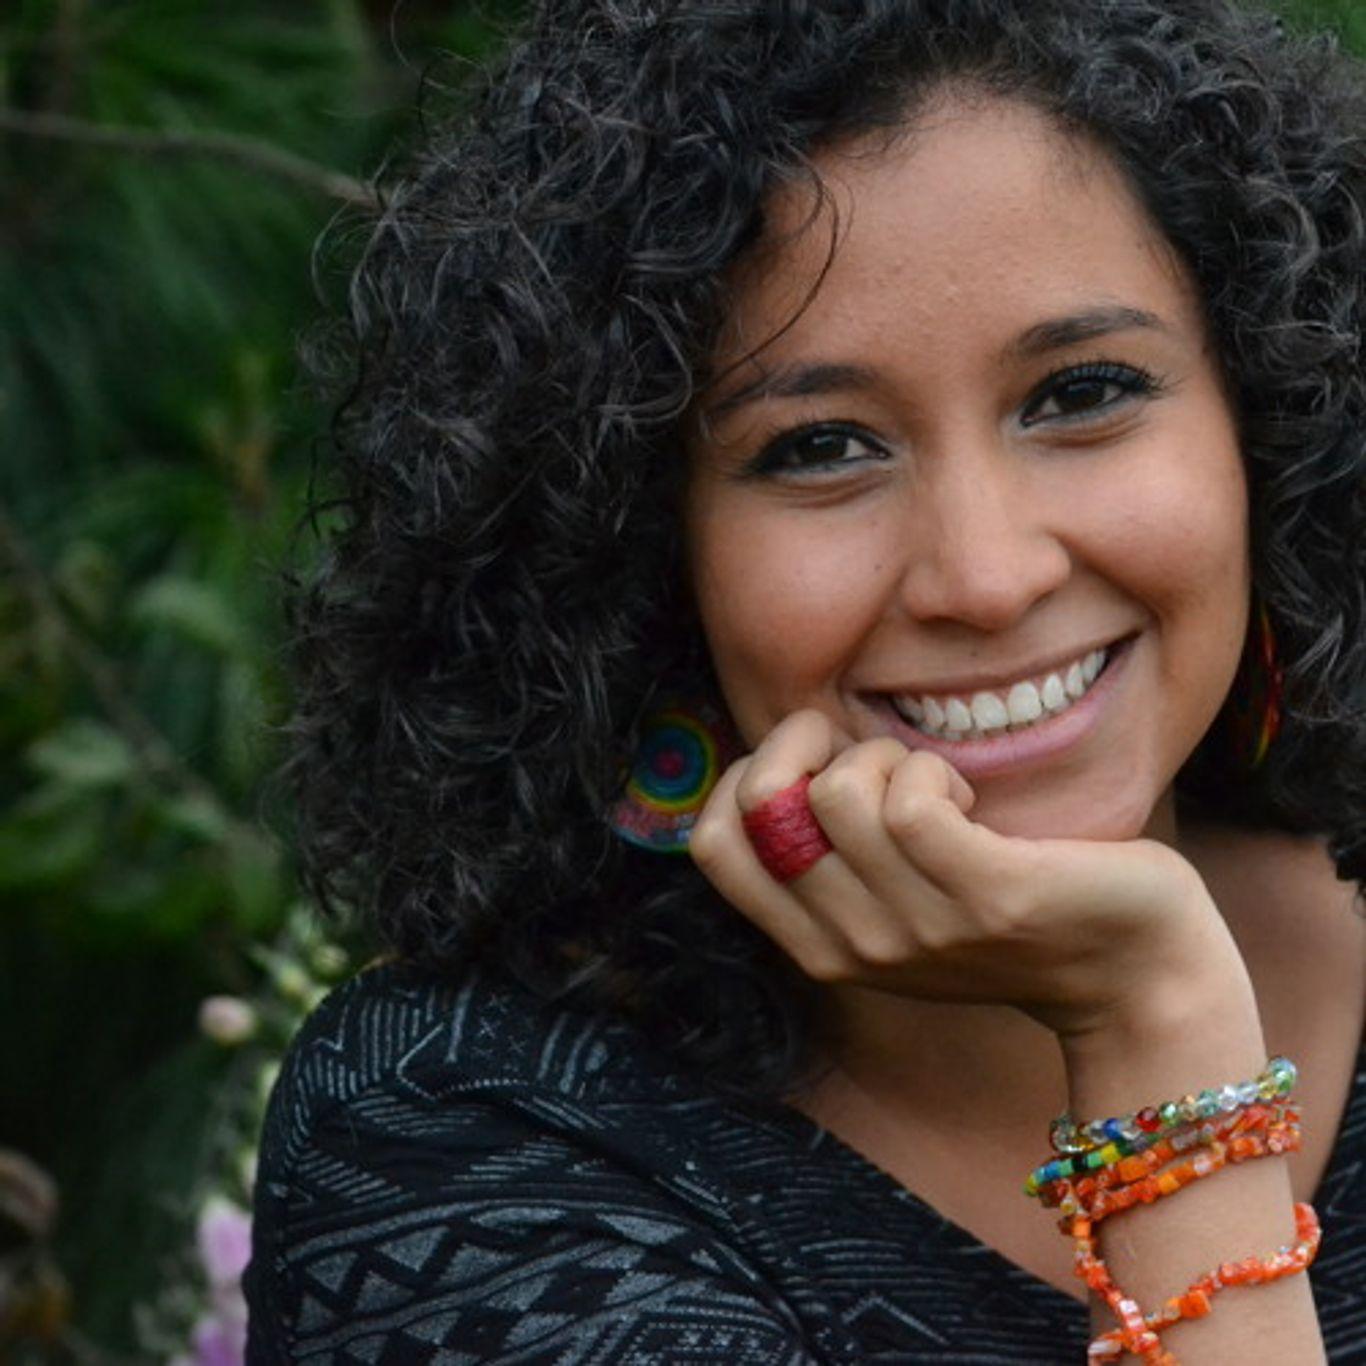 Victoria Saavedra